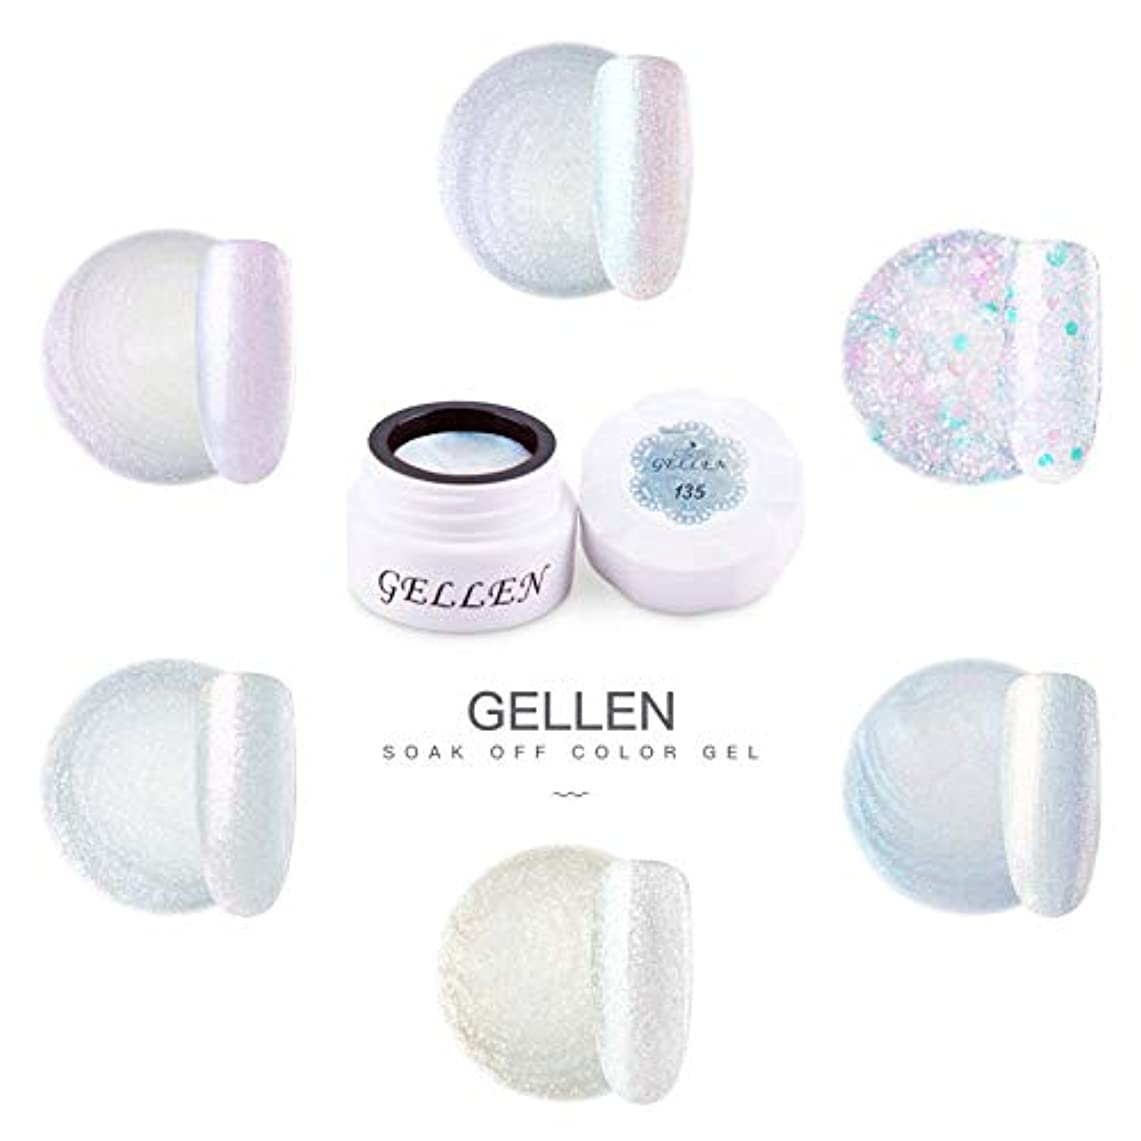 Gellen カラージェル 6色 セット[オーロラ カラー系]高品質 5g ジェルネイル カラー ネイルブラシ付き